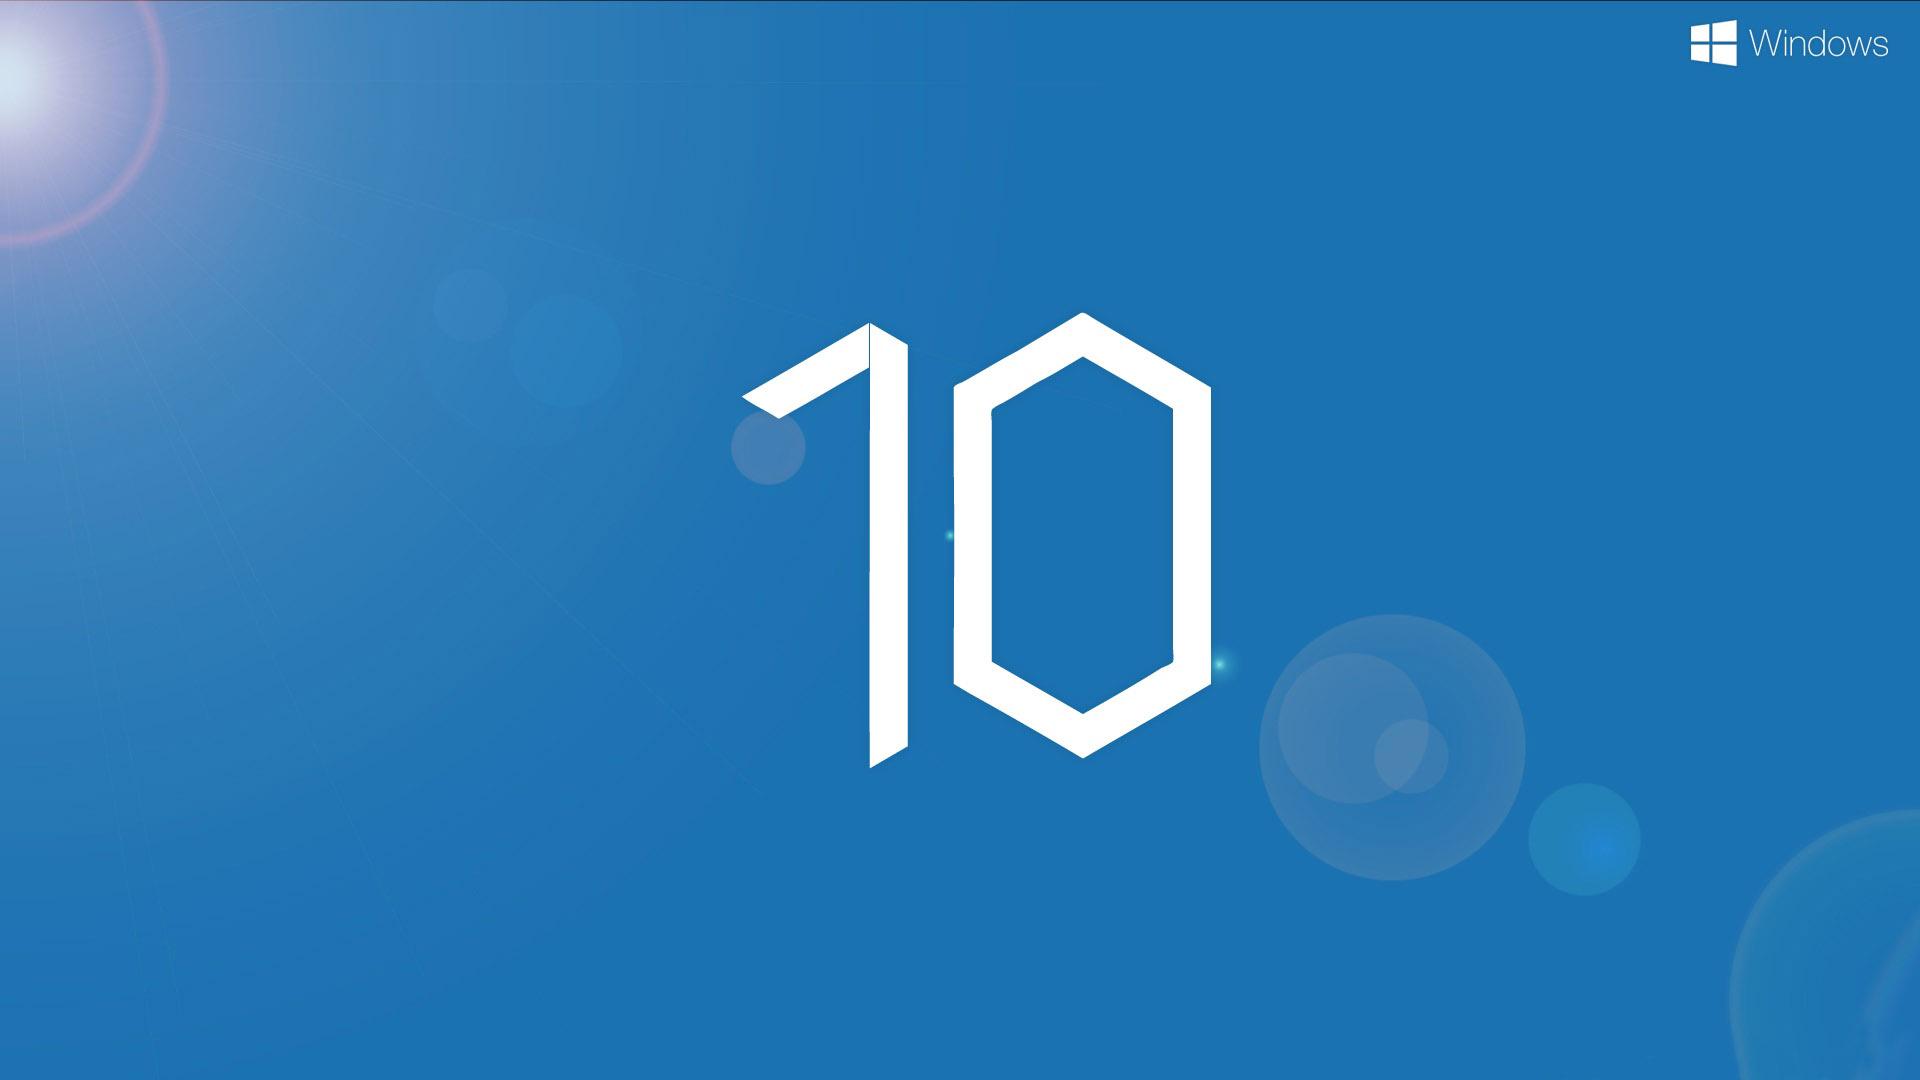 New Windows 10 Logo Desktop Wallpaper Wallpaper WallpaperLepi 1920x1080